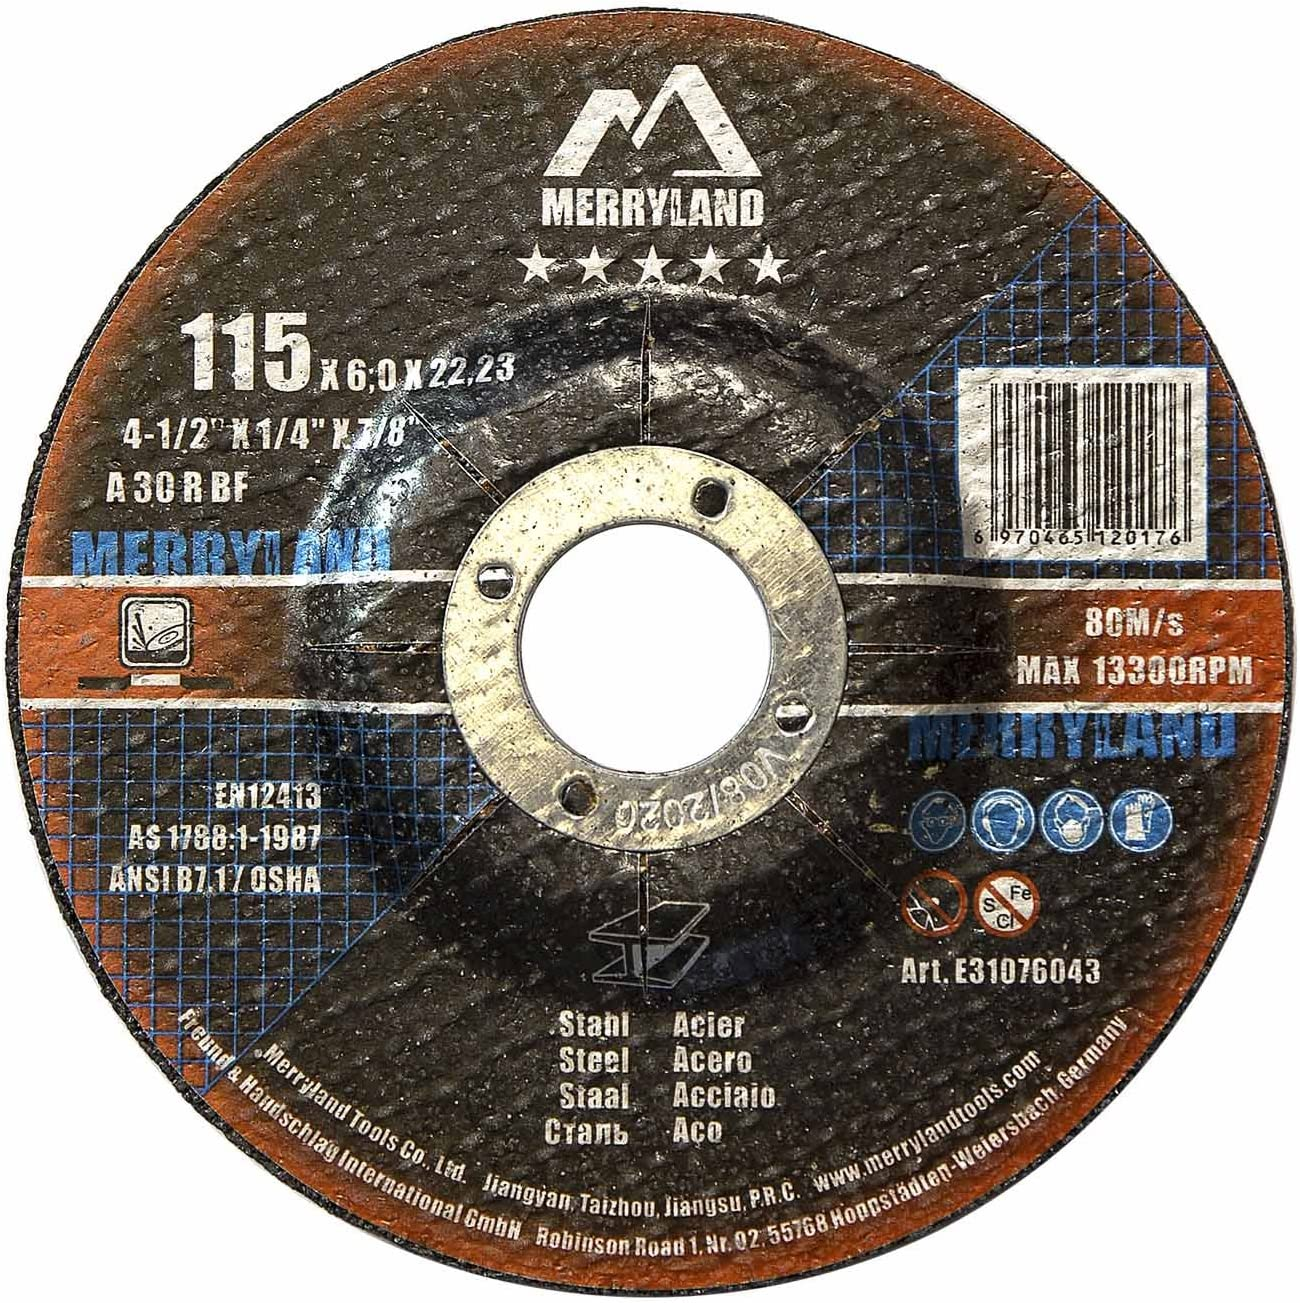 Merryland 4-1 2 X 1 4 Iro Metal Grinding Expert-line Wheel Outlet El Paso Mall sale feature Steel